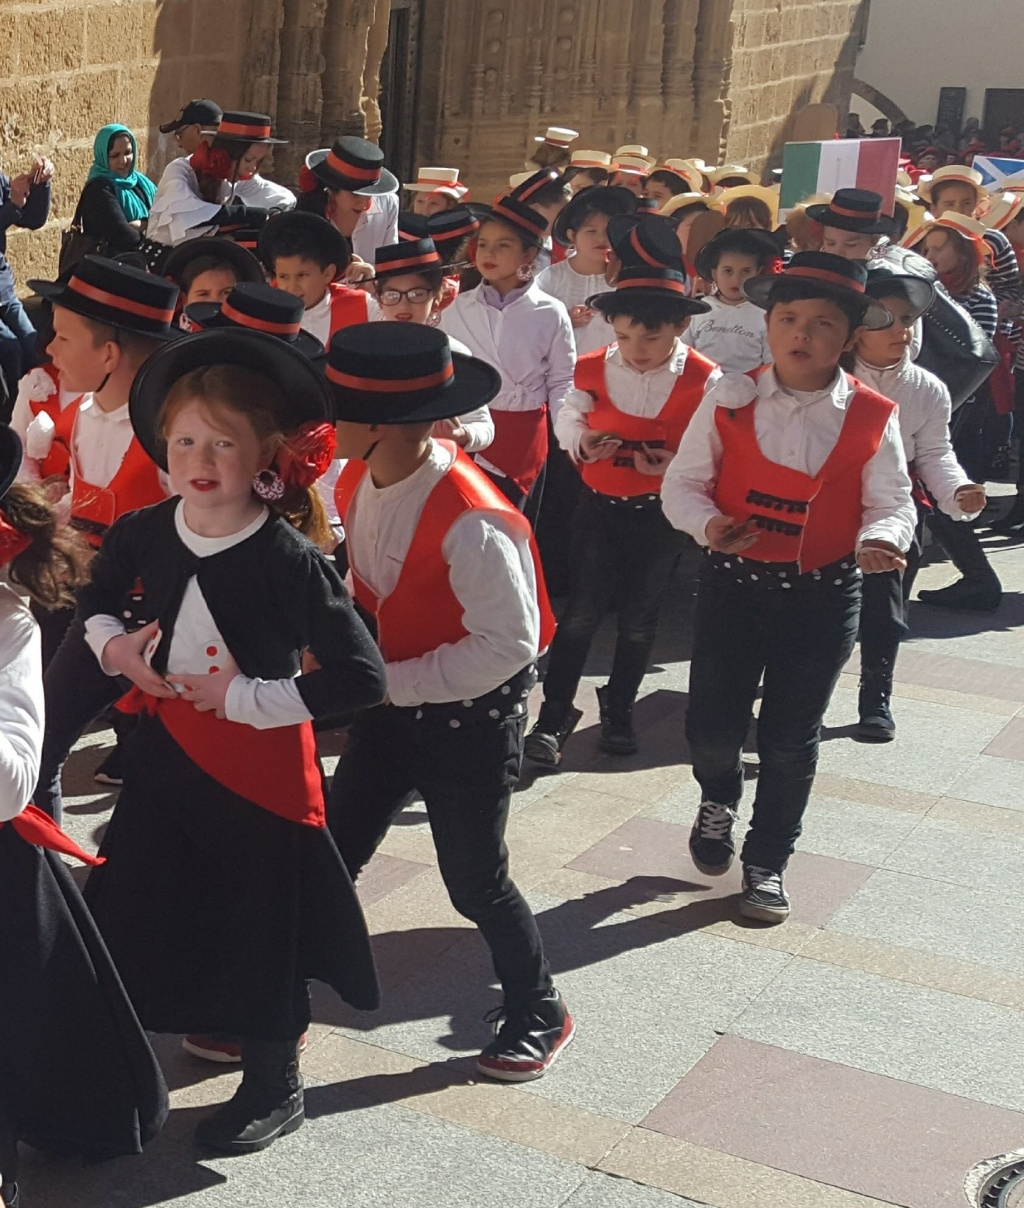 Fiestas in Javea: Carnival - Carnestoltes Xabia (February 2020)